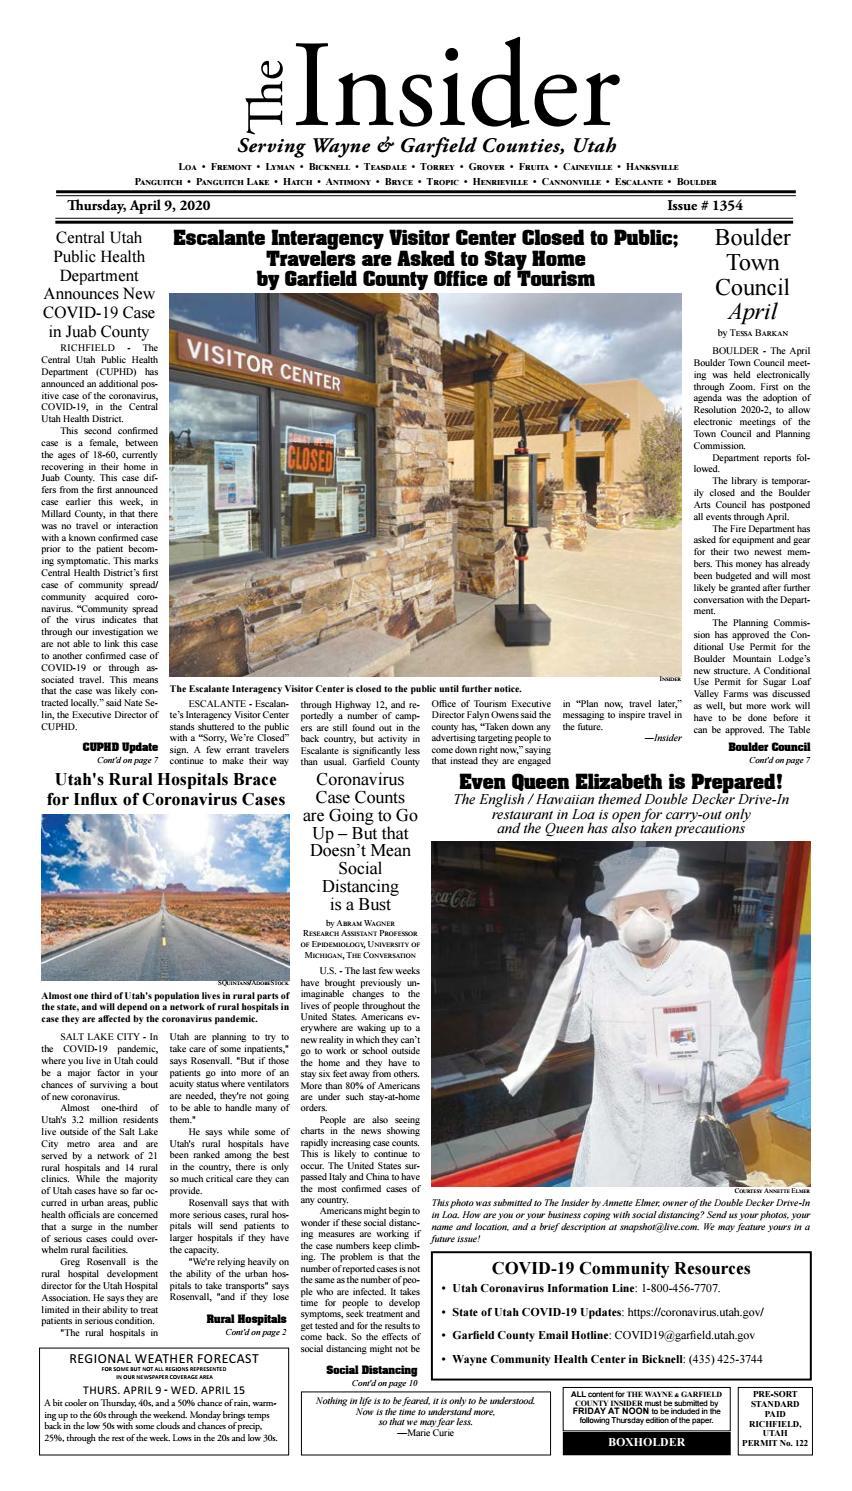 The Wayne Garfield County Insider April 9 2020 By Snapshot Multimedia Llc Issuu